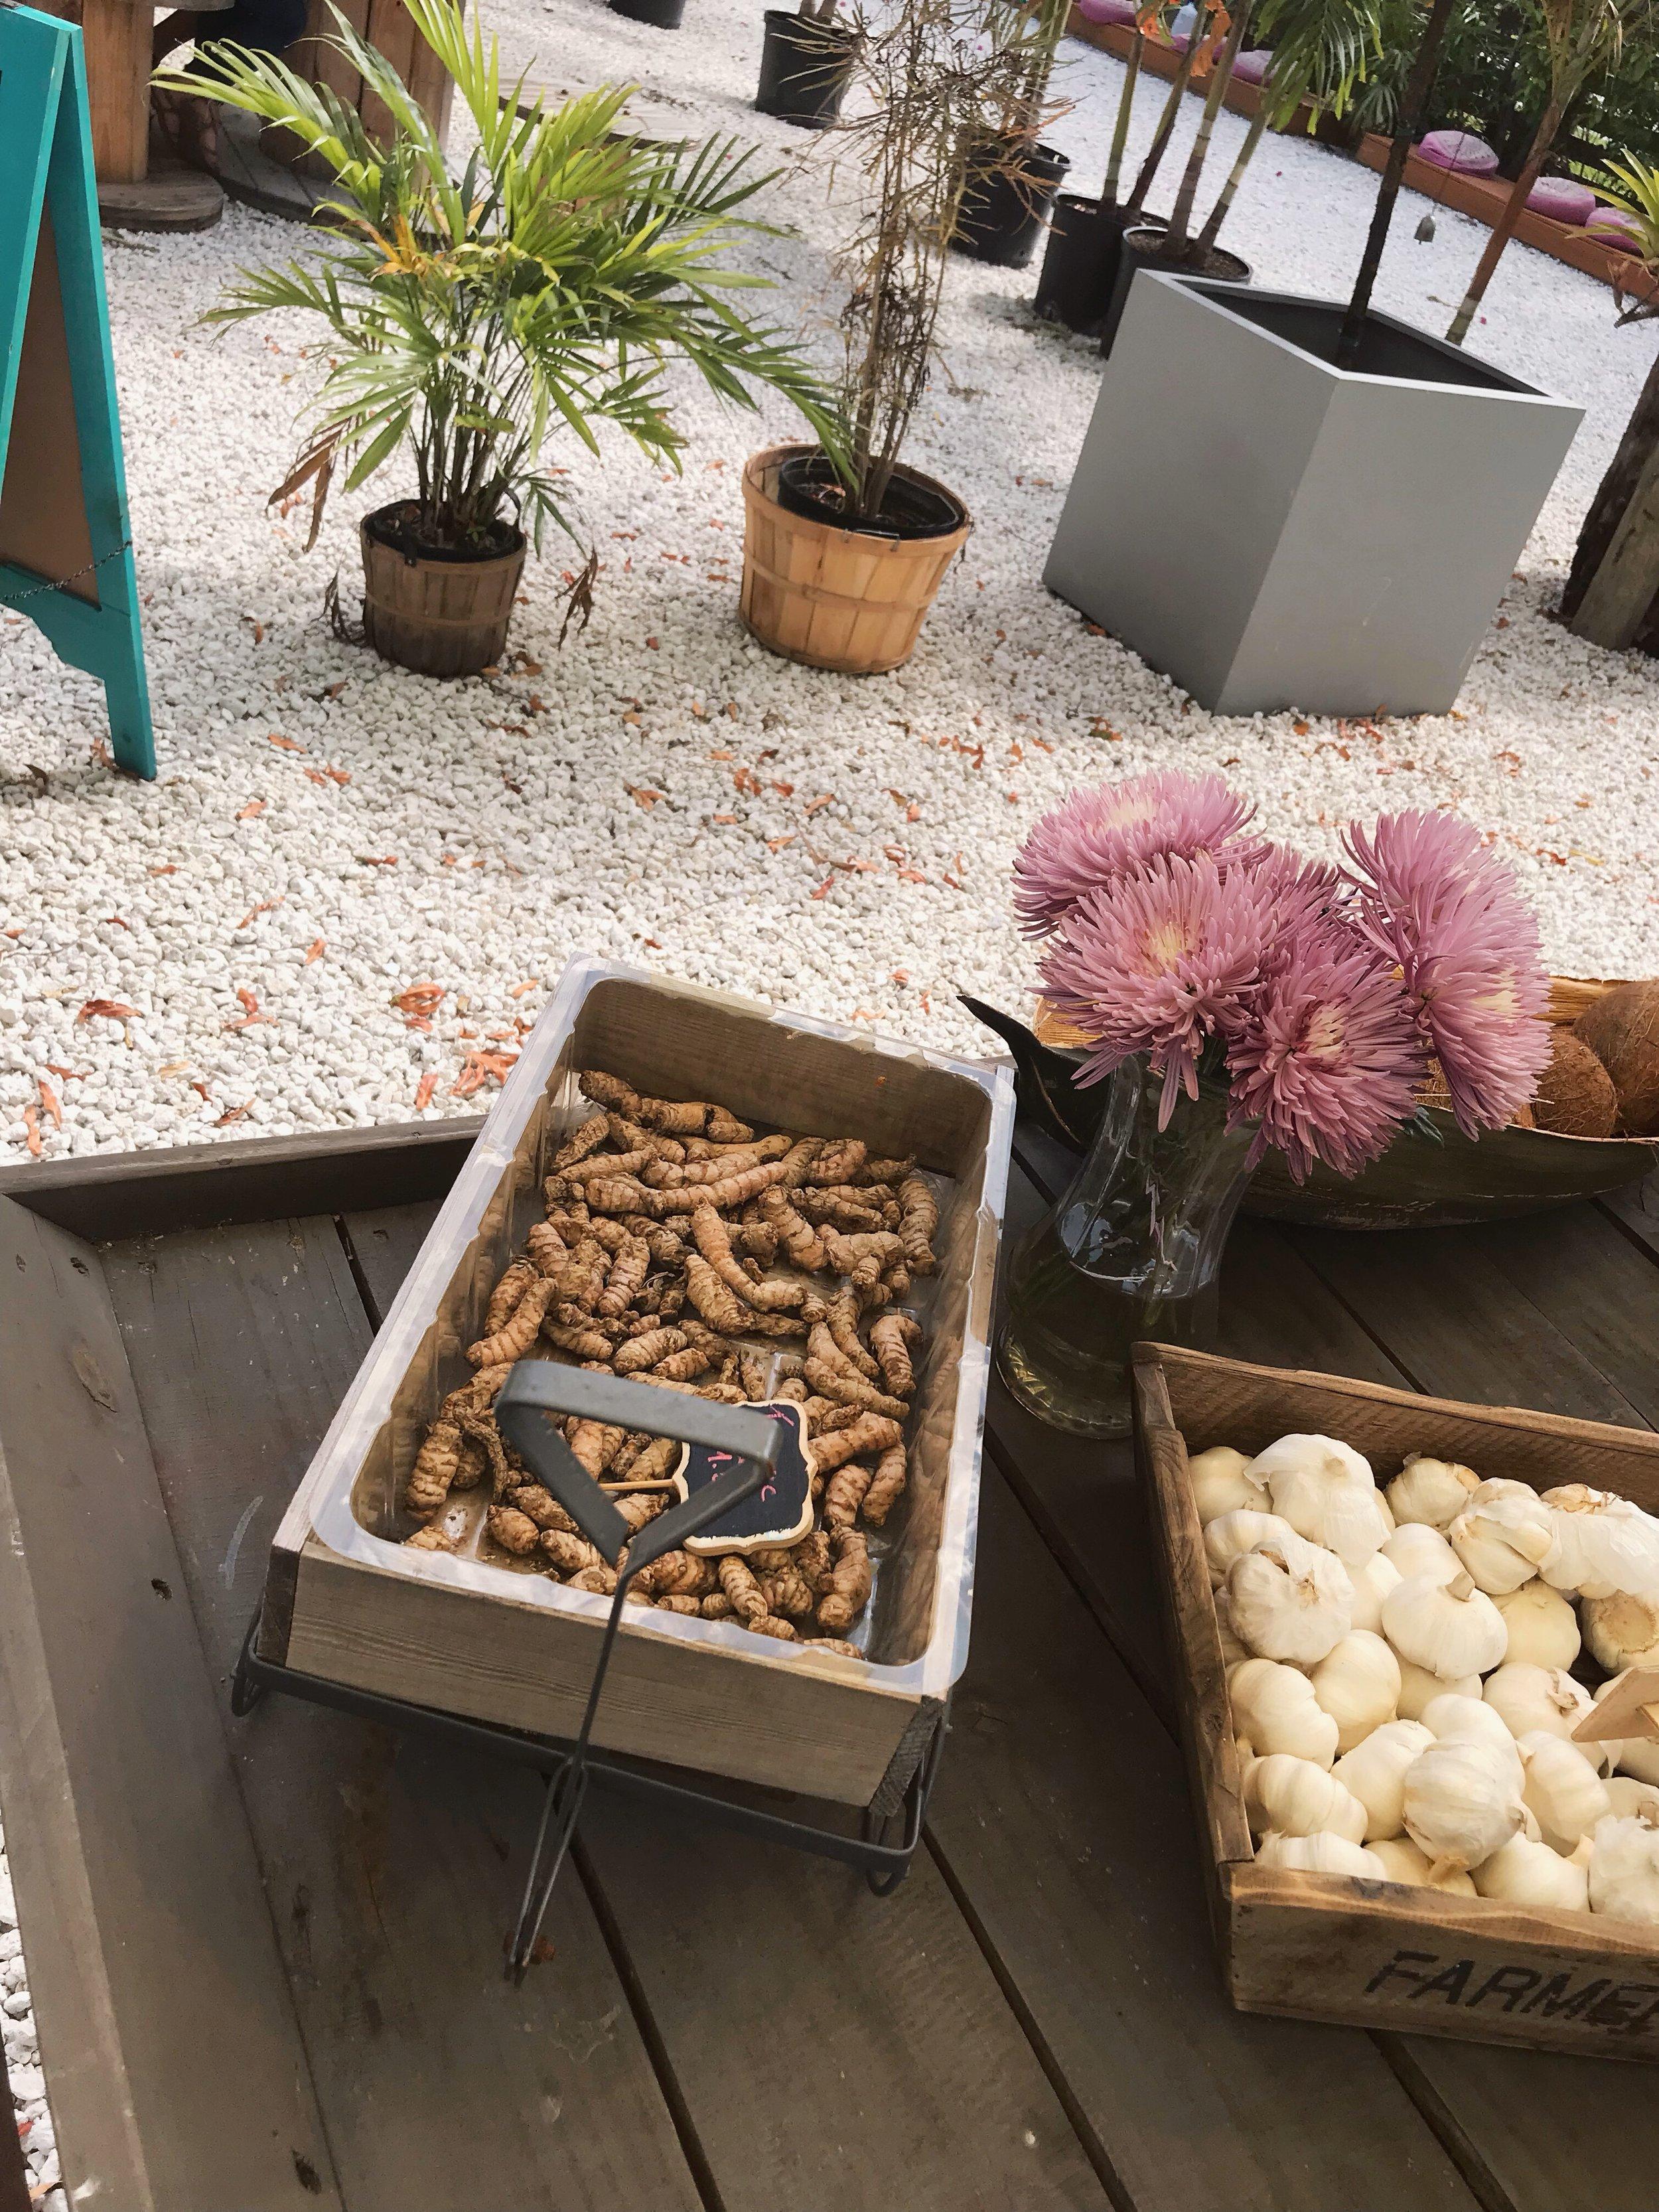 aguacate sanctuary vegan miami.JPG